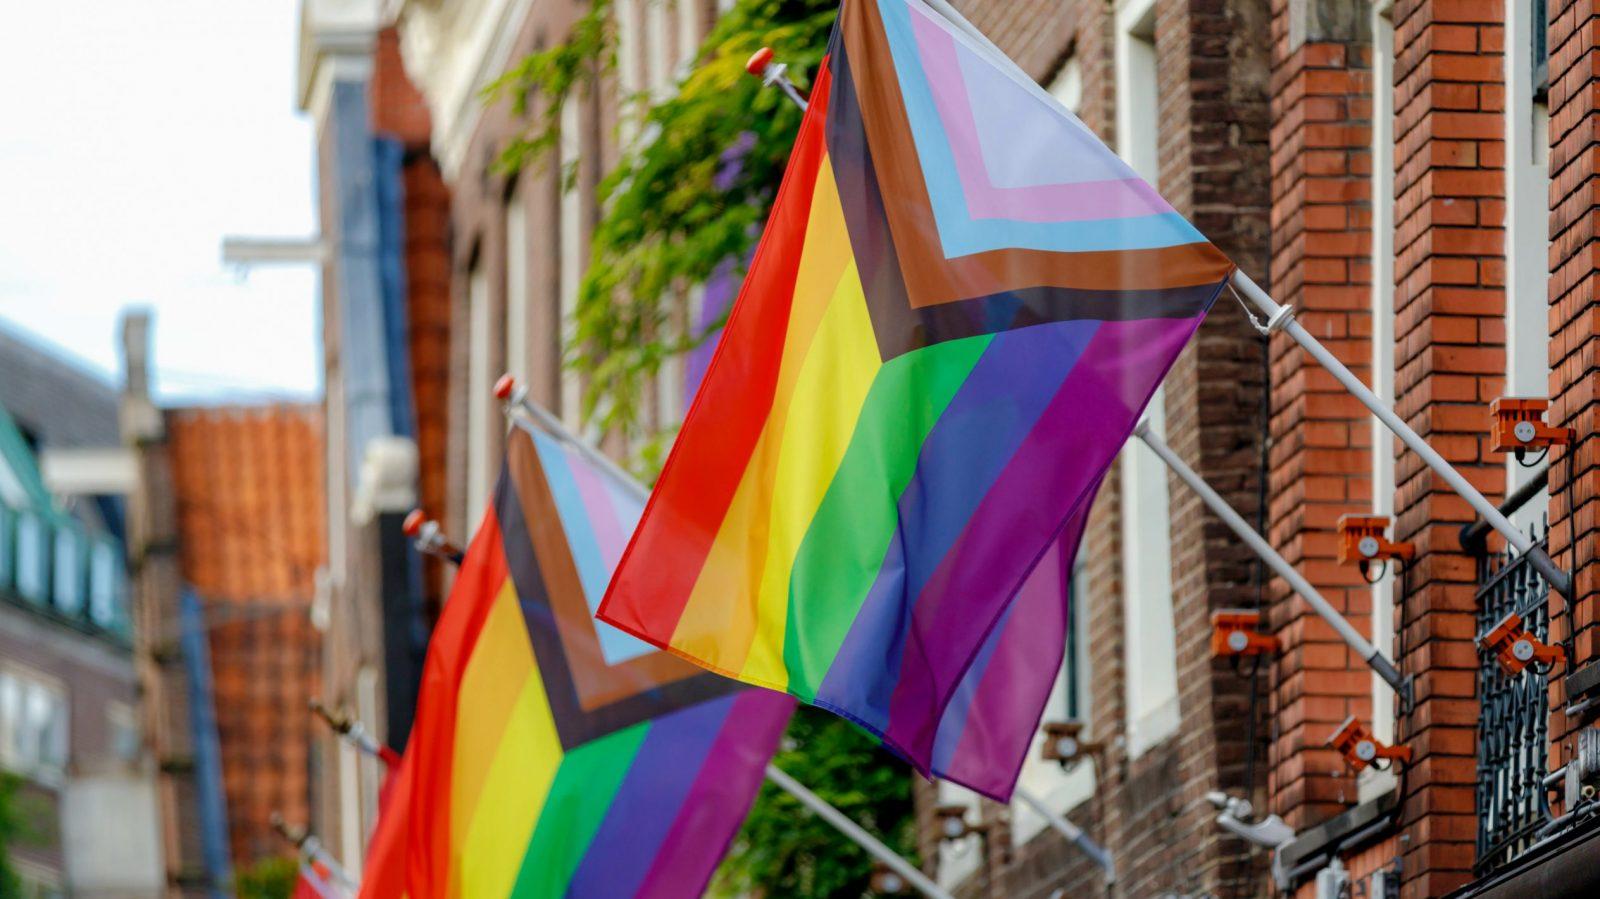 Progress pride flag on city street